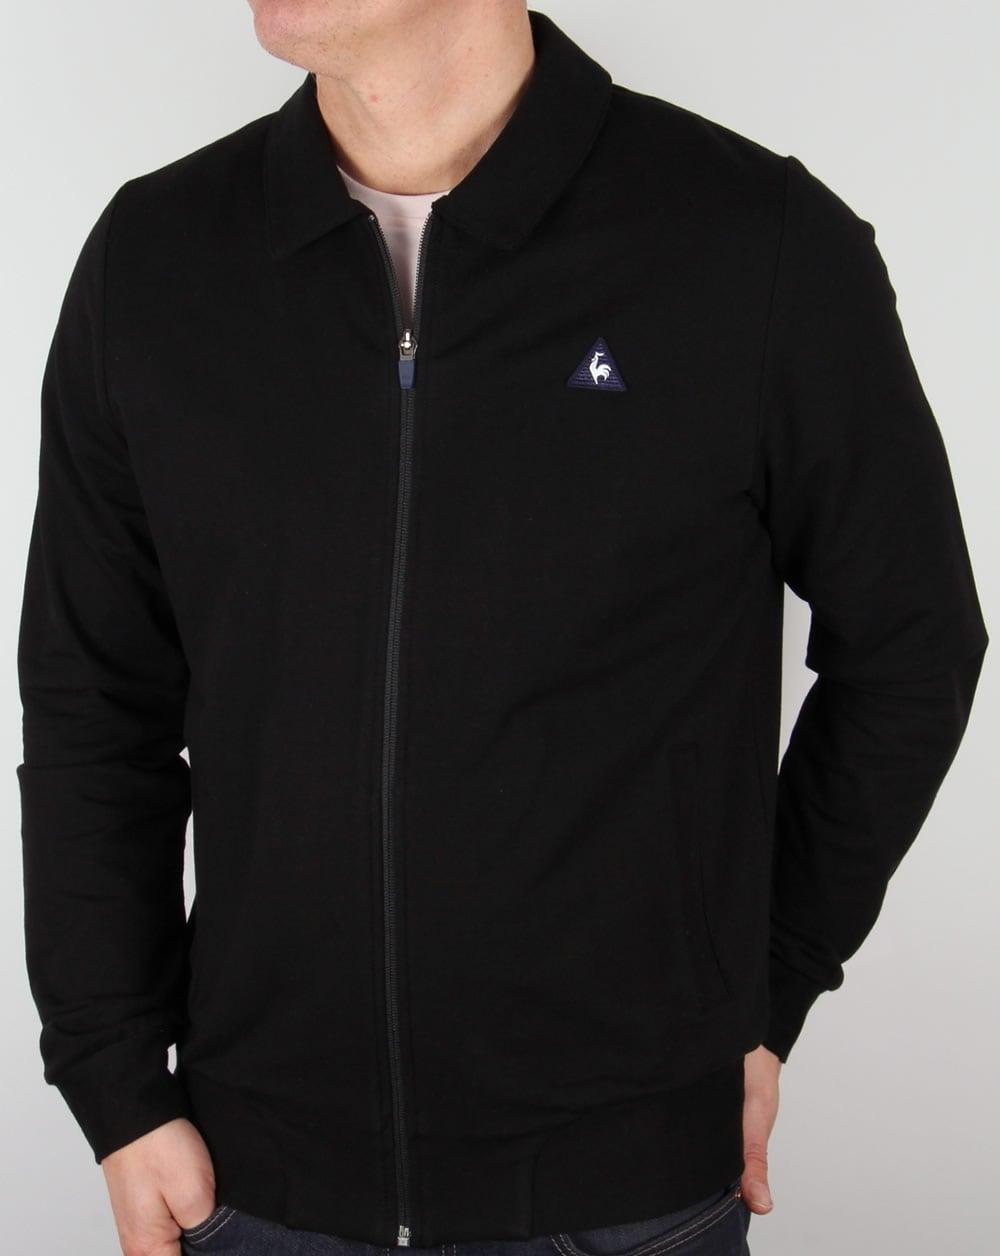 49e6b88d63 Le Coq Sportif Ciodo Track Top Black,jacket,tracksuit,mens